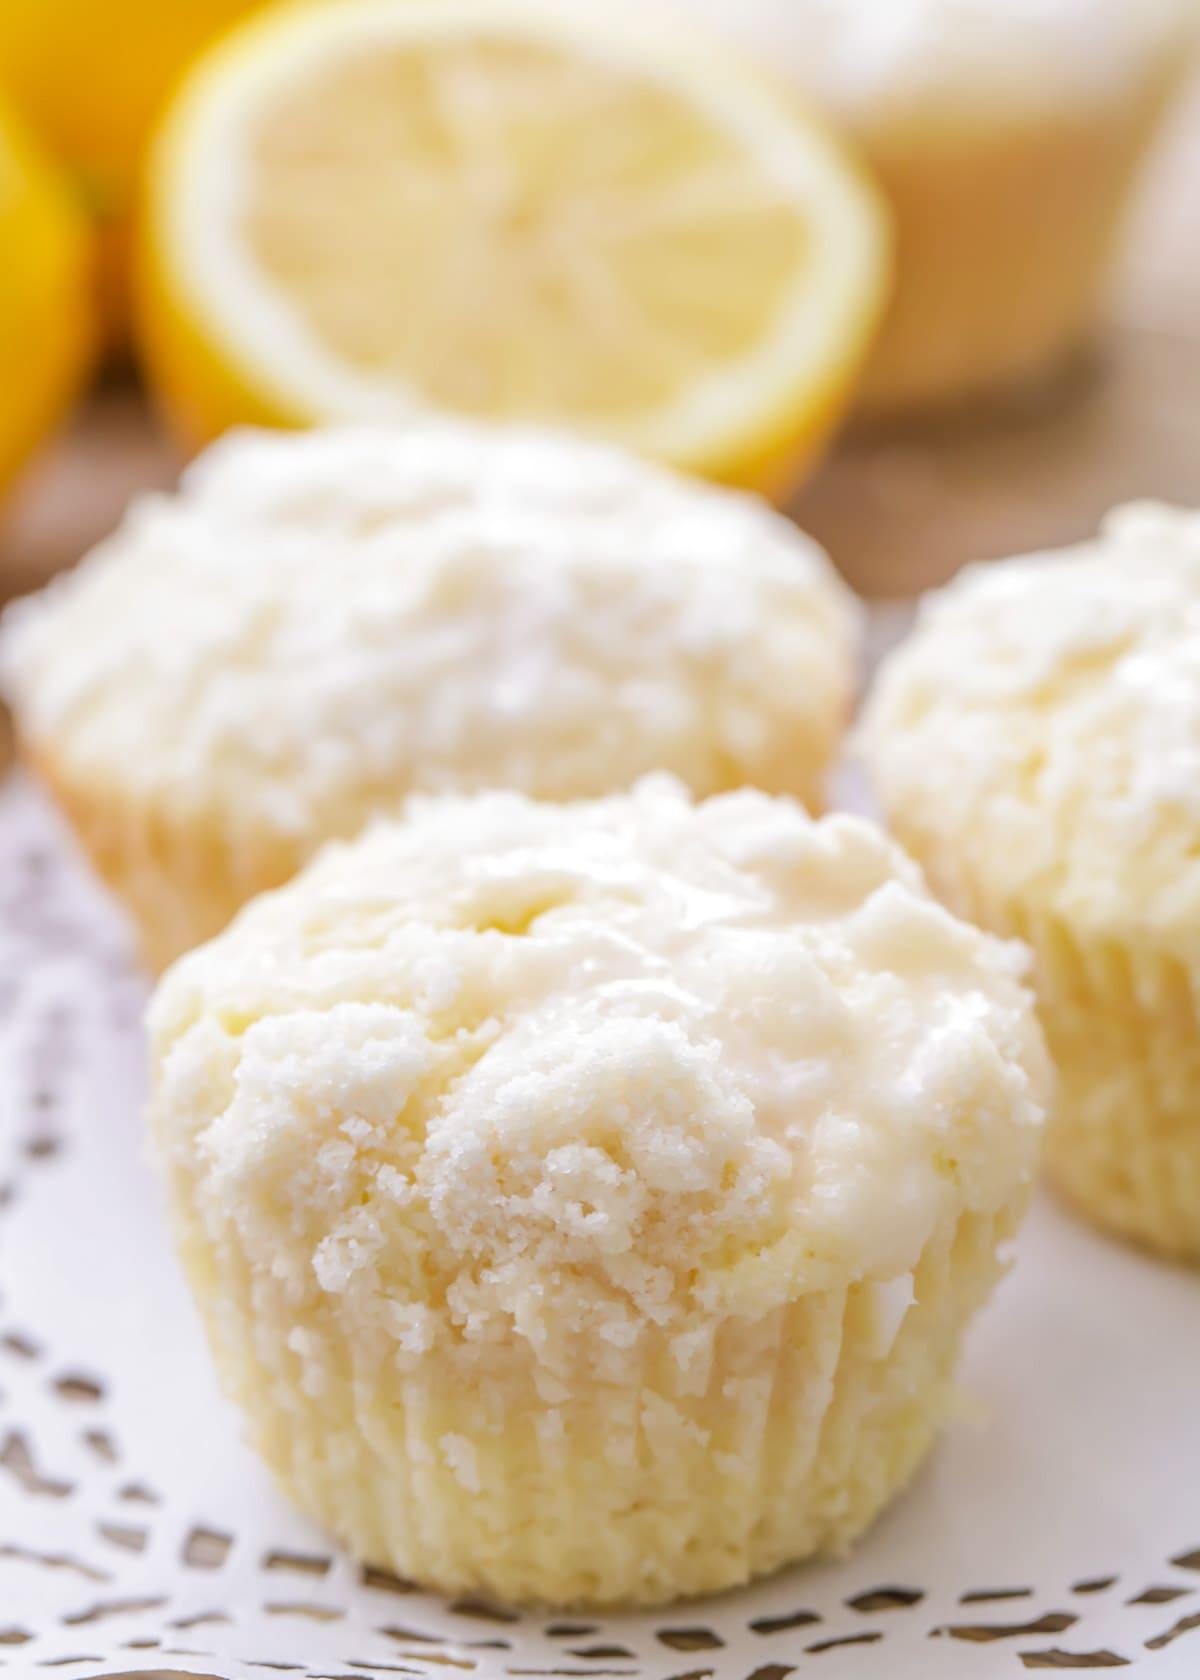 Lemon muffins with lemon crumb topping